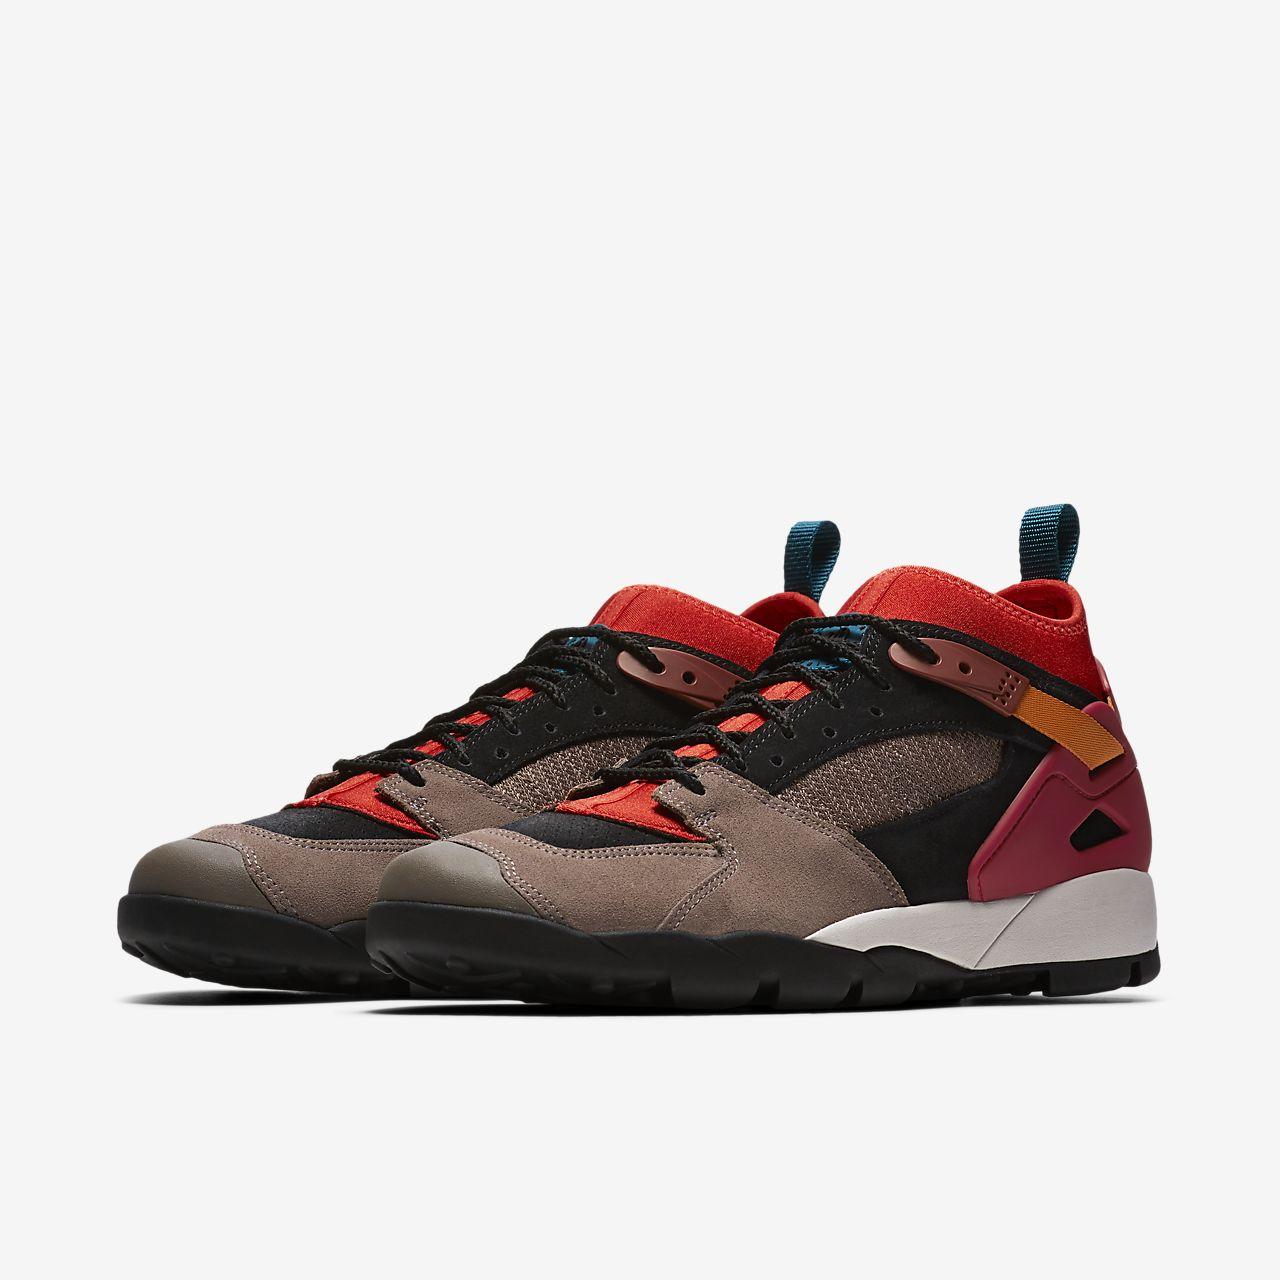 4c7df7d3f304 Nike ACG Air Revaderchi Men s Shoe. Nike.com AU